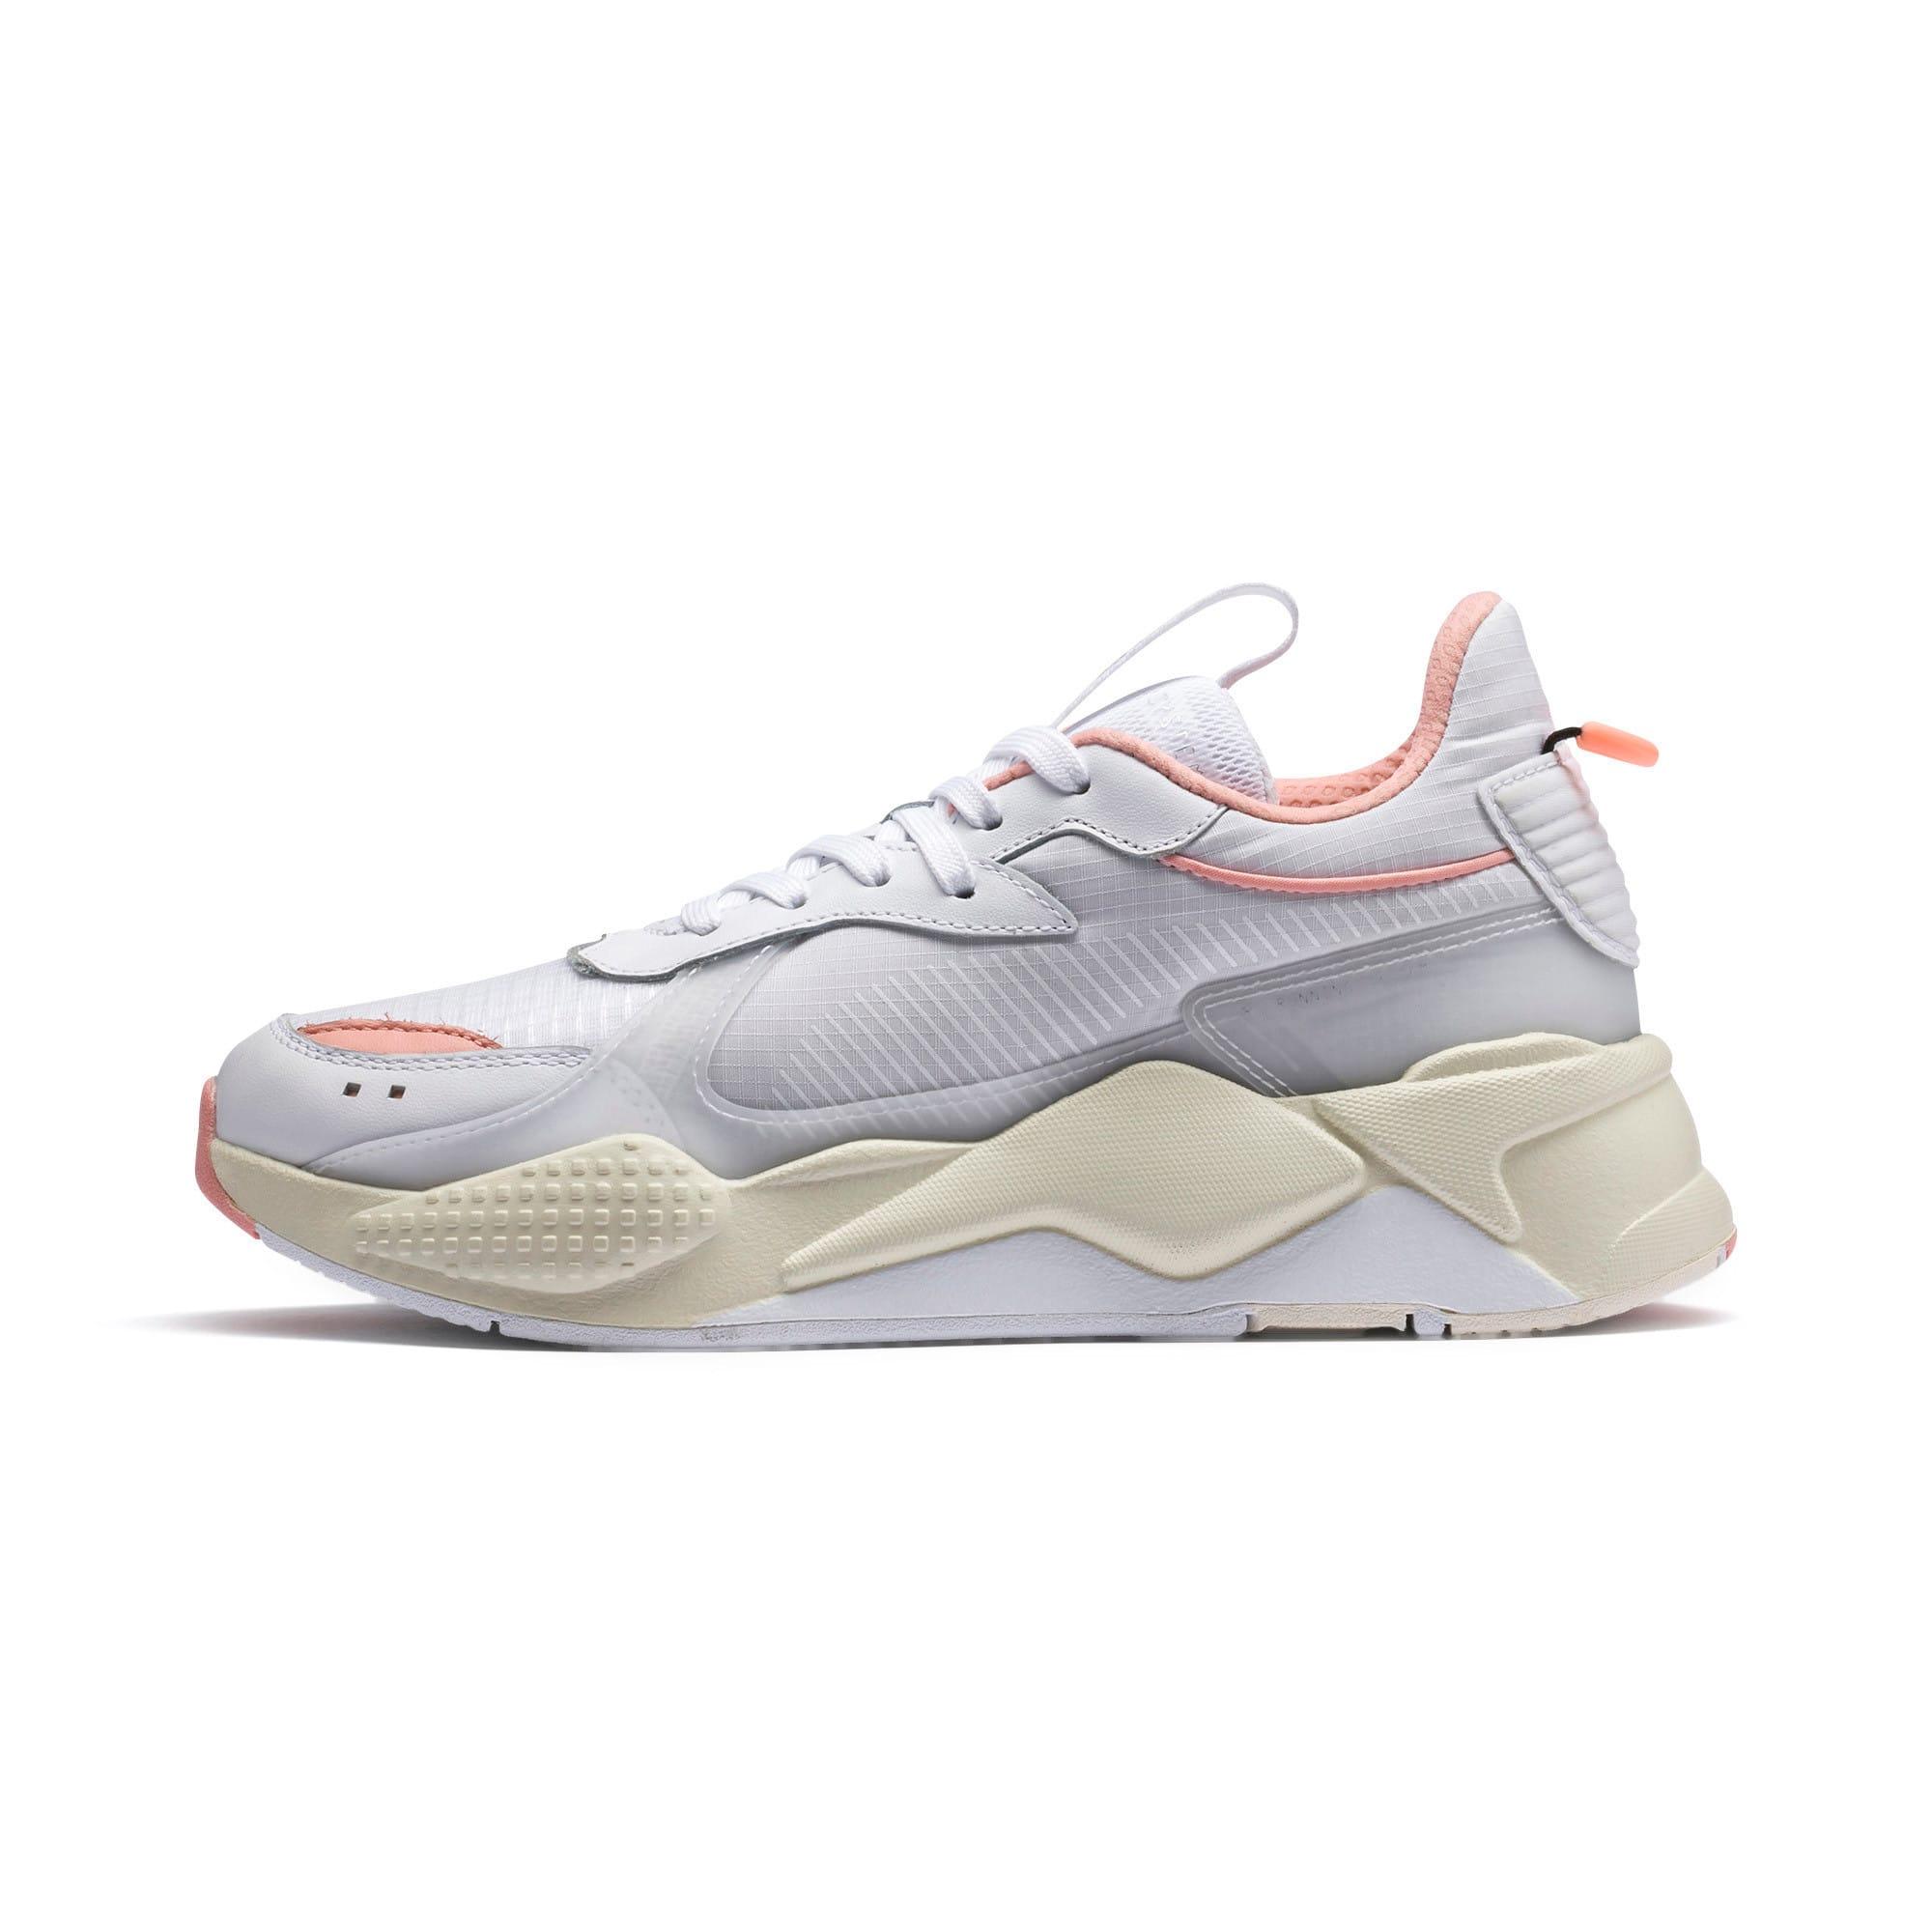 Thumbnail 1 of RS-X Tech Women's Sneakers, Puma White-Peach Bud, medium